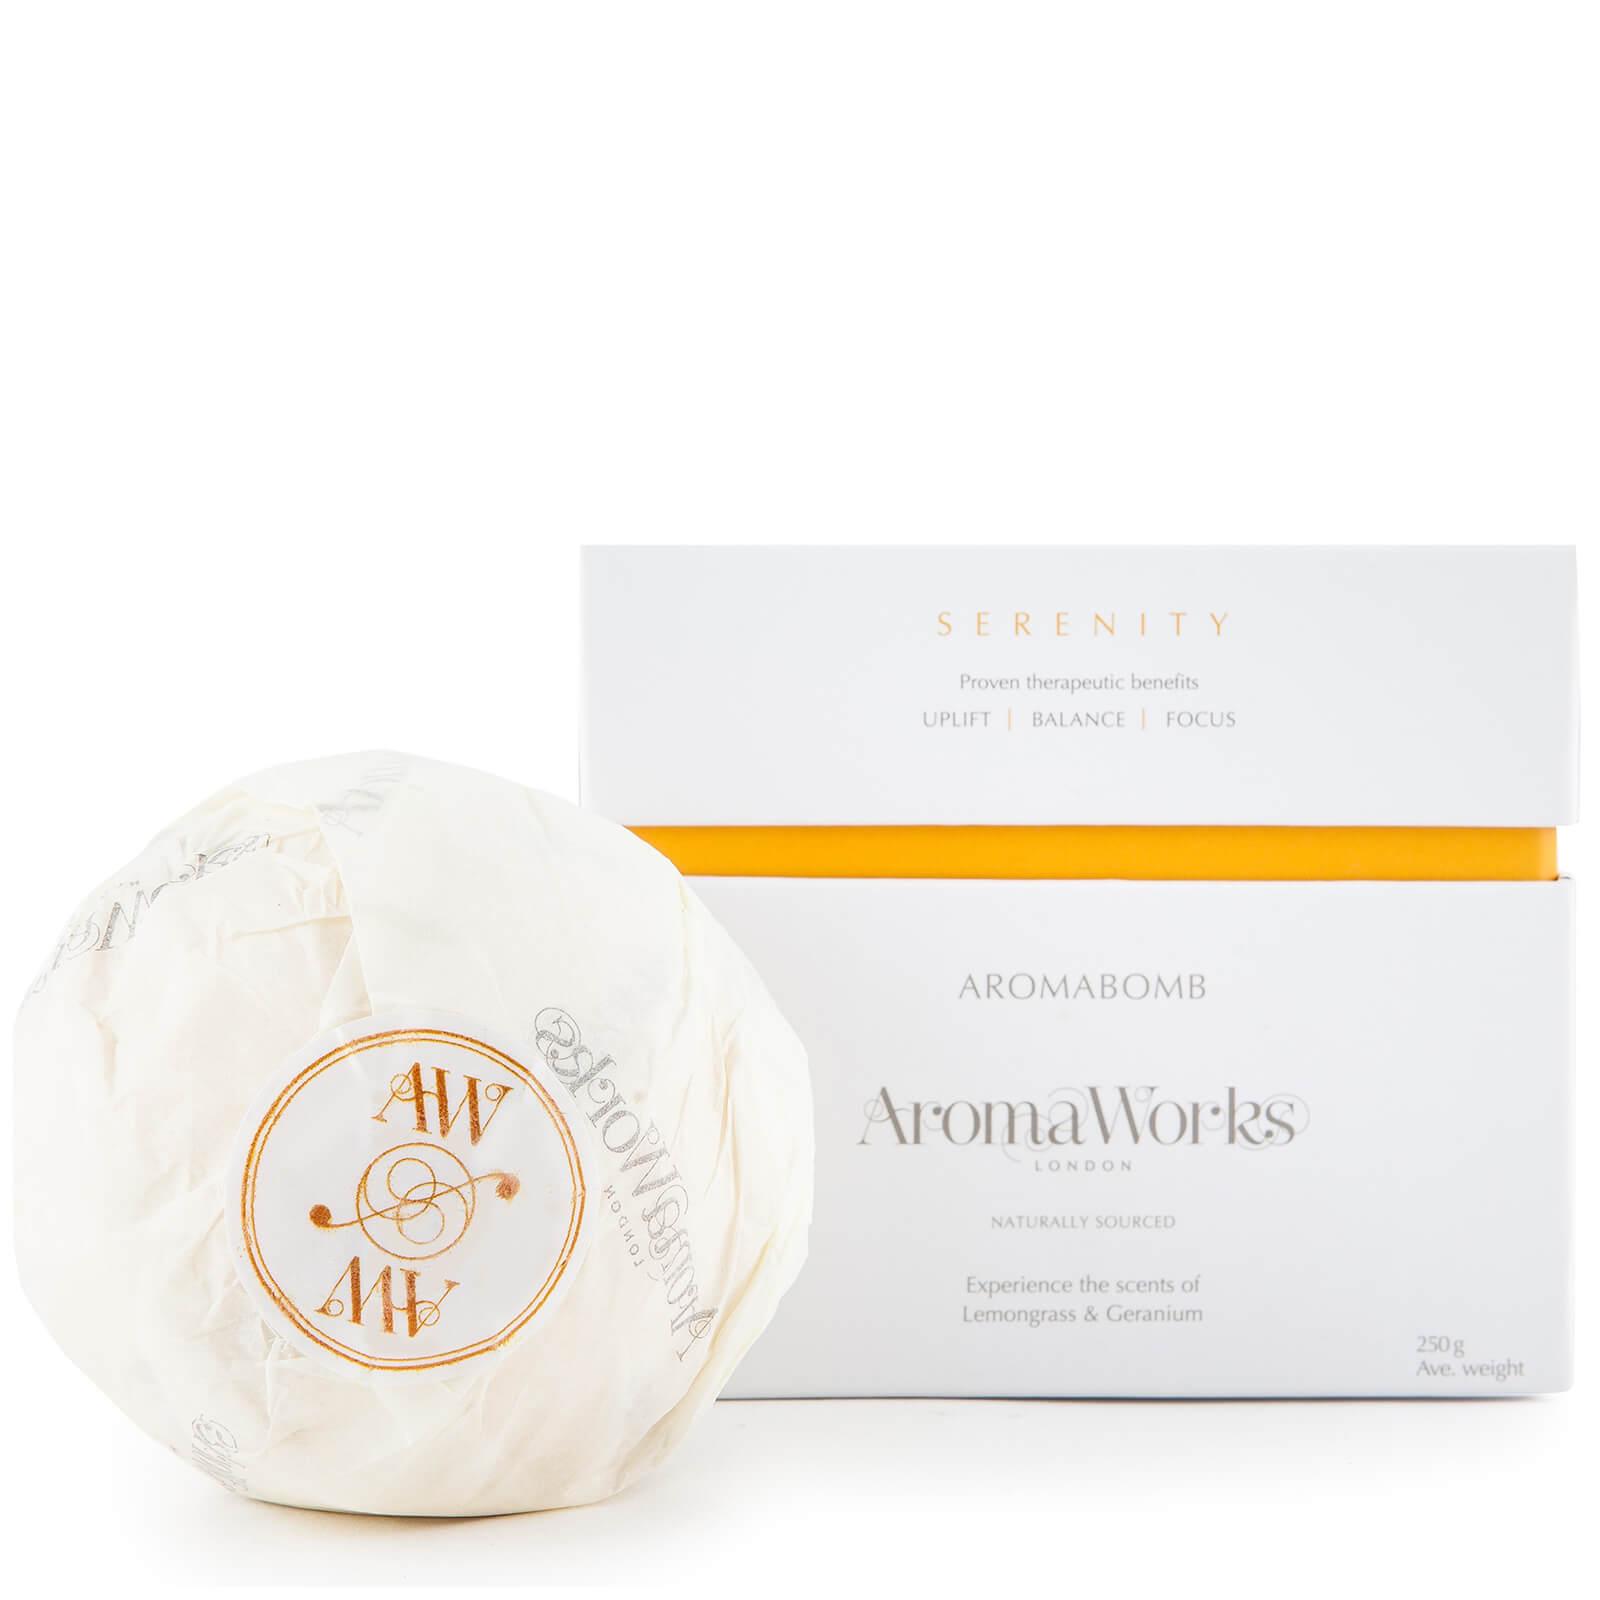 Bomba de baño terapéutica Serenity de AromaWorks